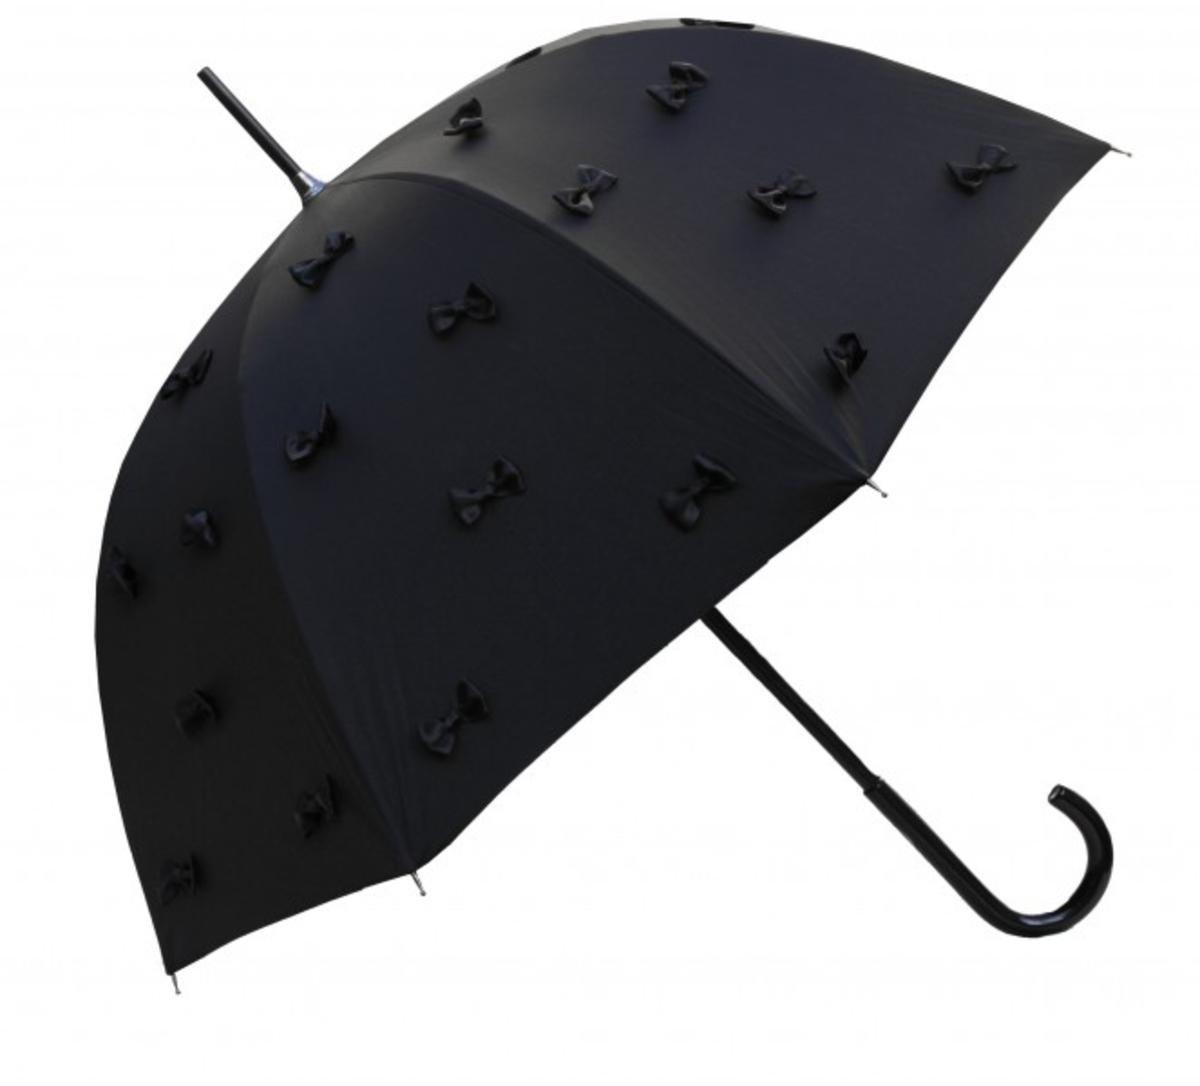 Guy De Jean Designer Umbrella Black with attached loops - Umbrella - Elegant and Extravagant - Made